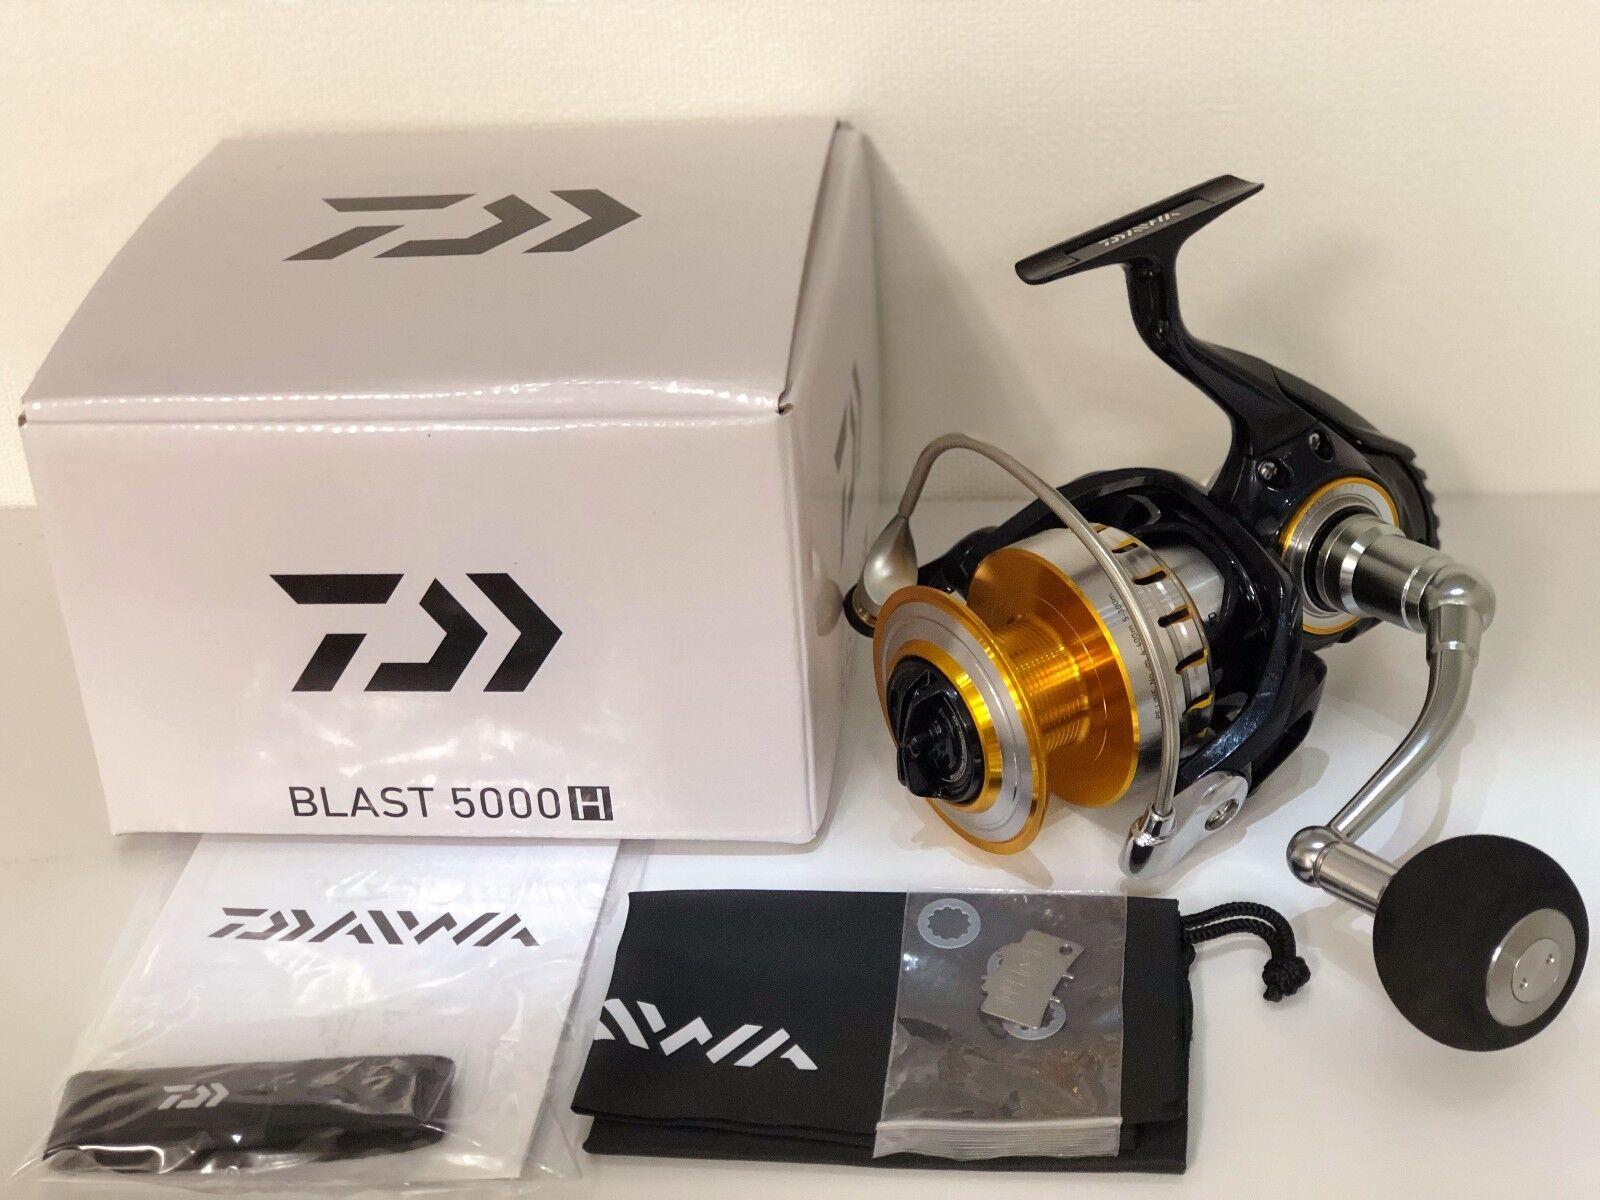 DAIWA 16 BLAST 5000H   - - - gratuito Shipping from Japan 632